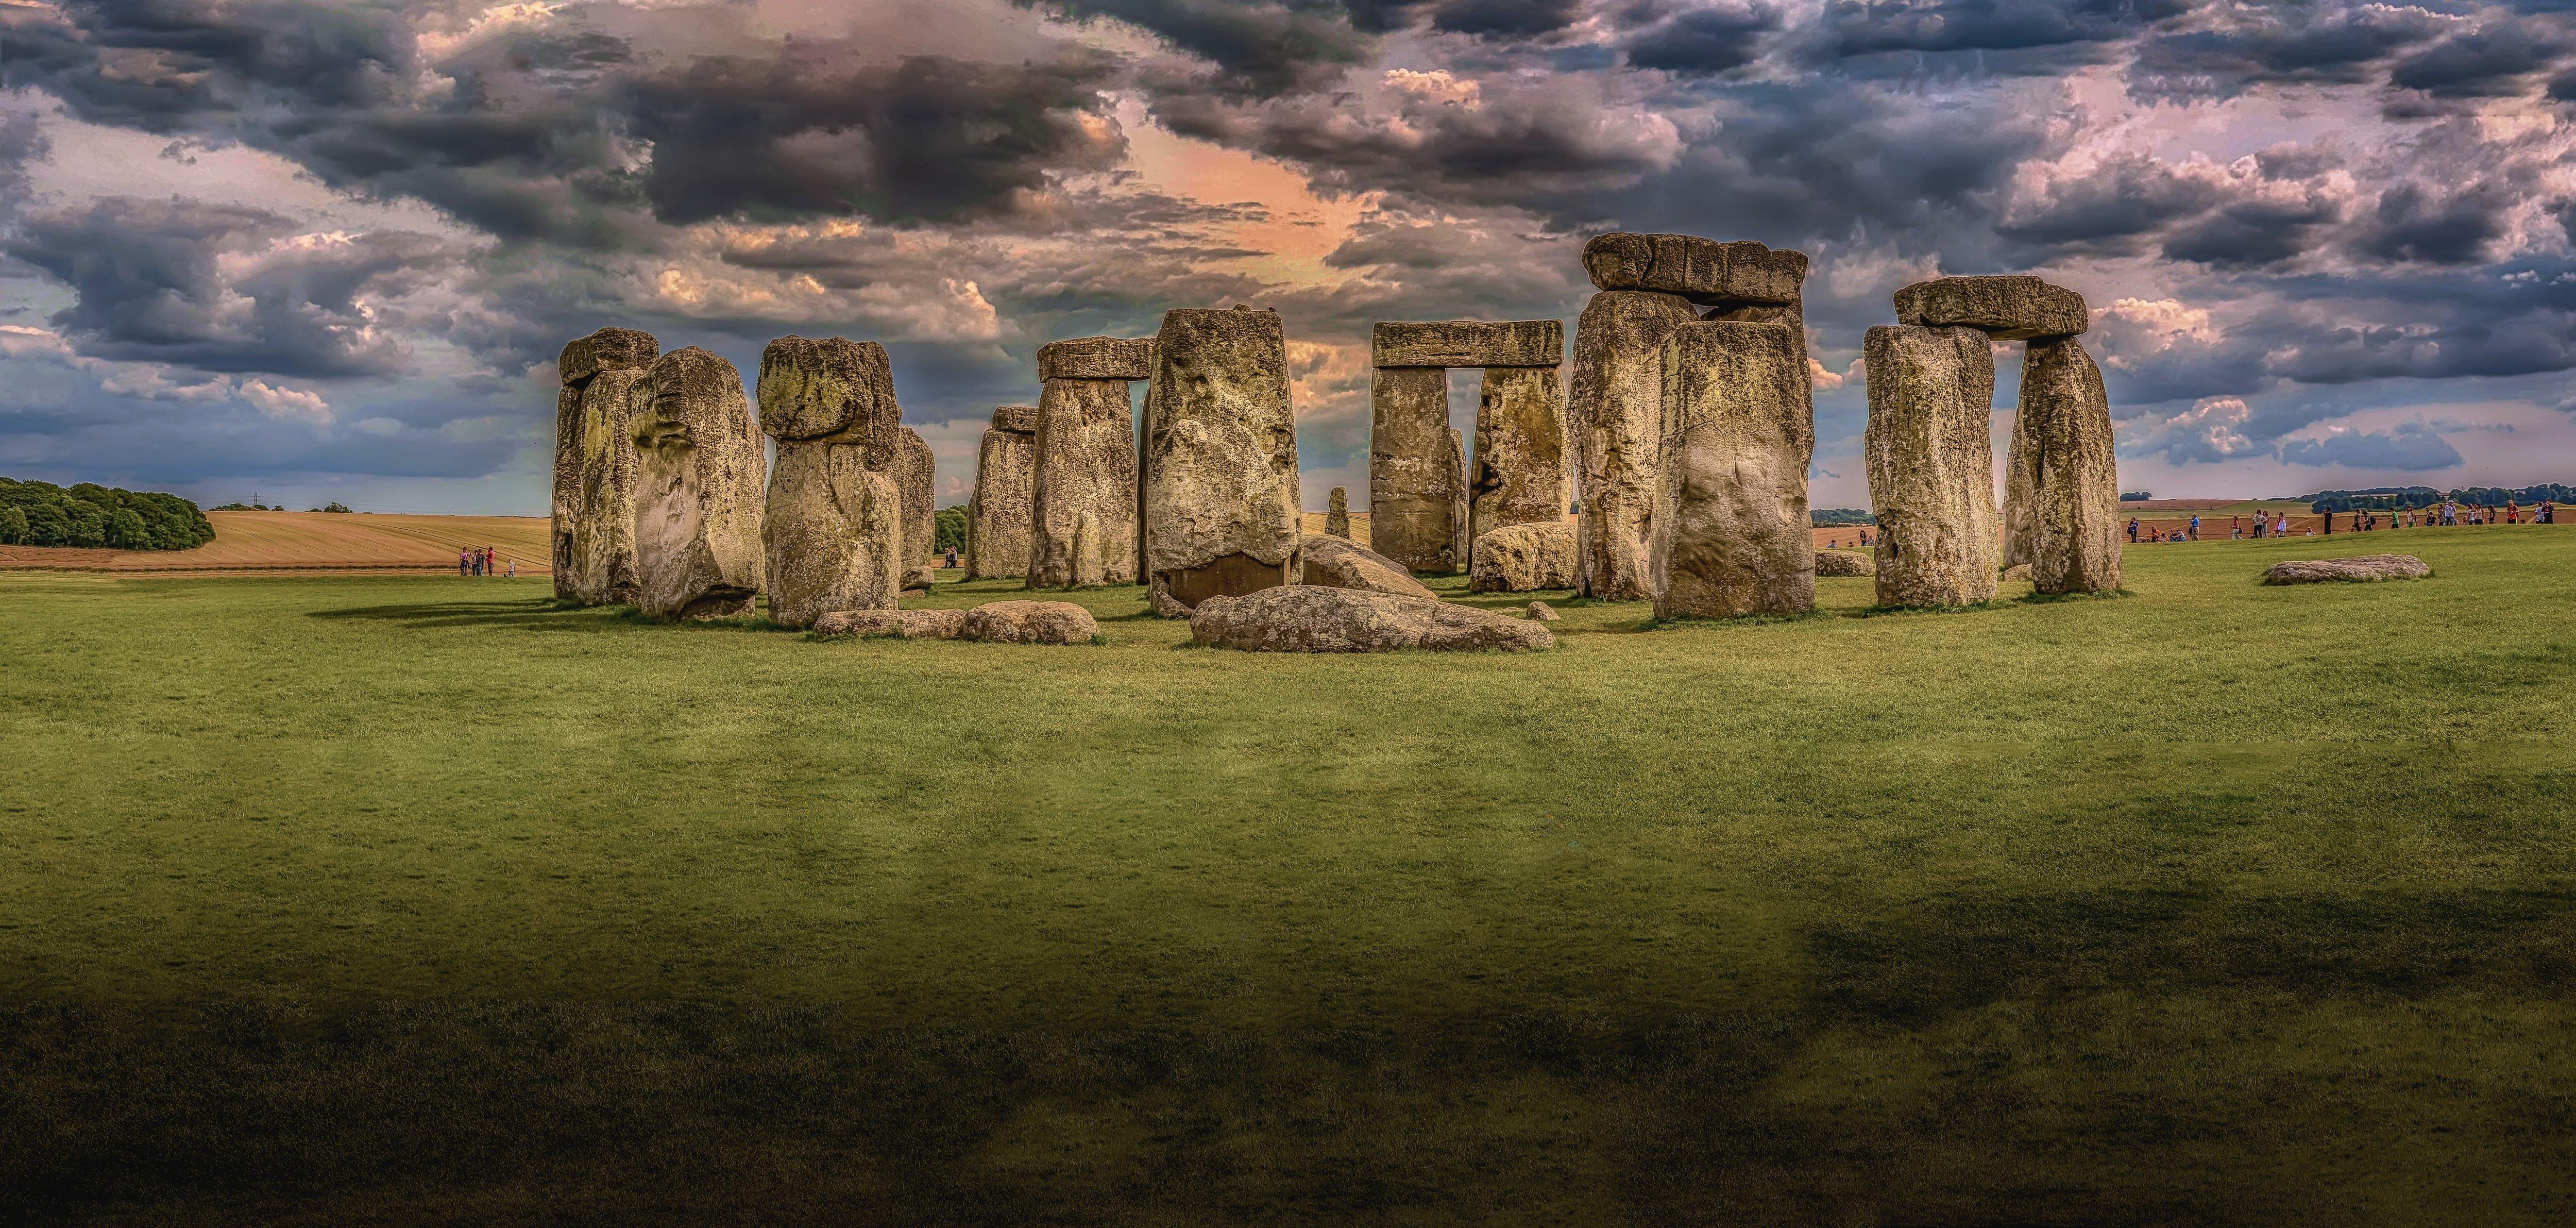 Stonehenge Under Nimbostratus Clouds